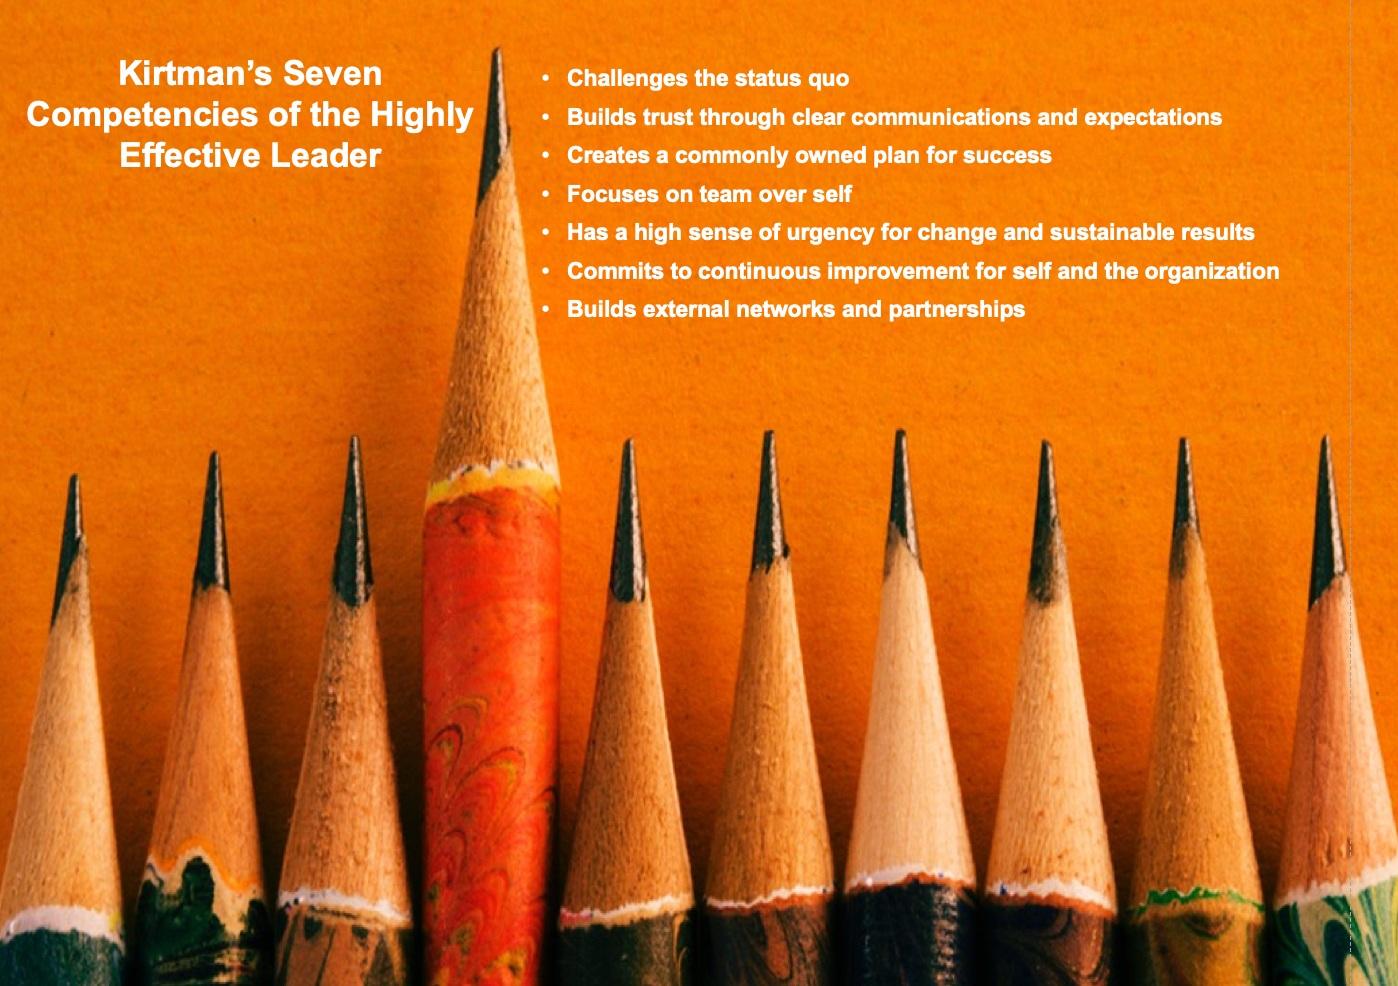 © Lyle Kirtman – Leadership: Key Competencies for Whole-System Change